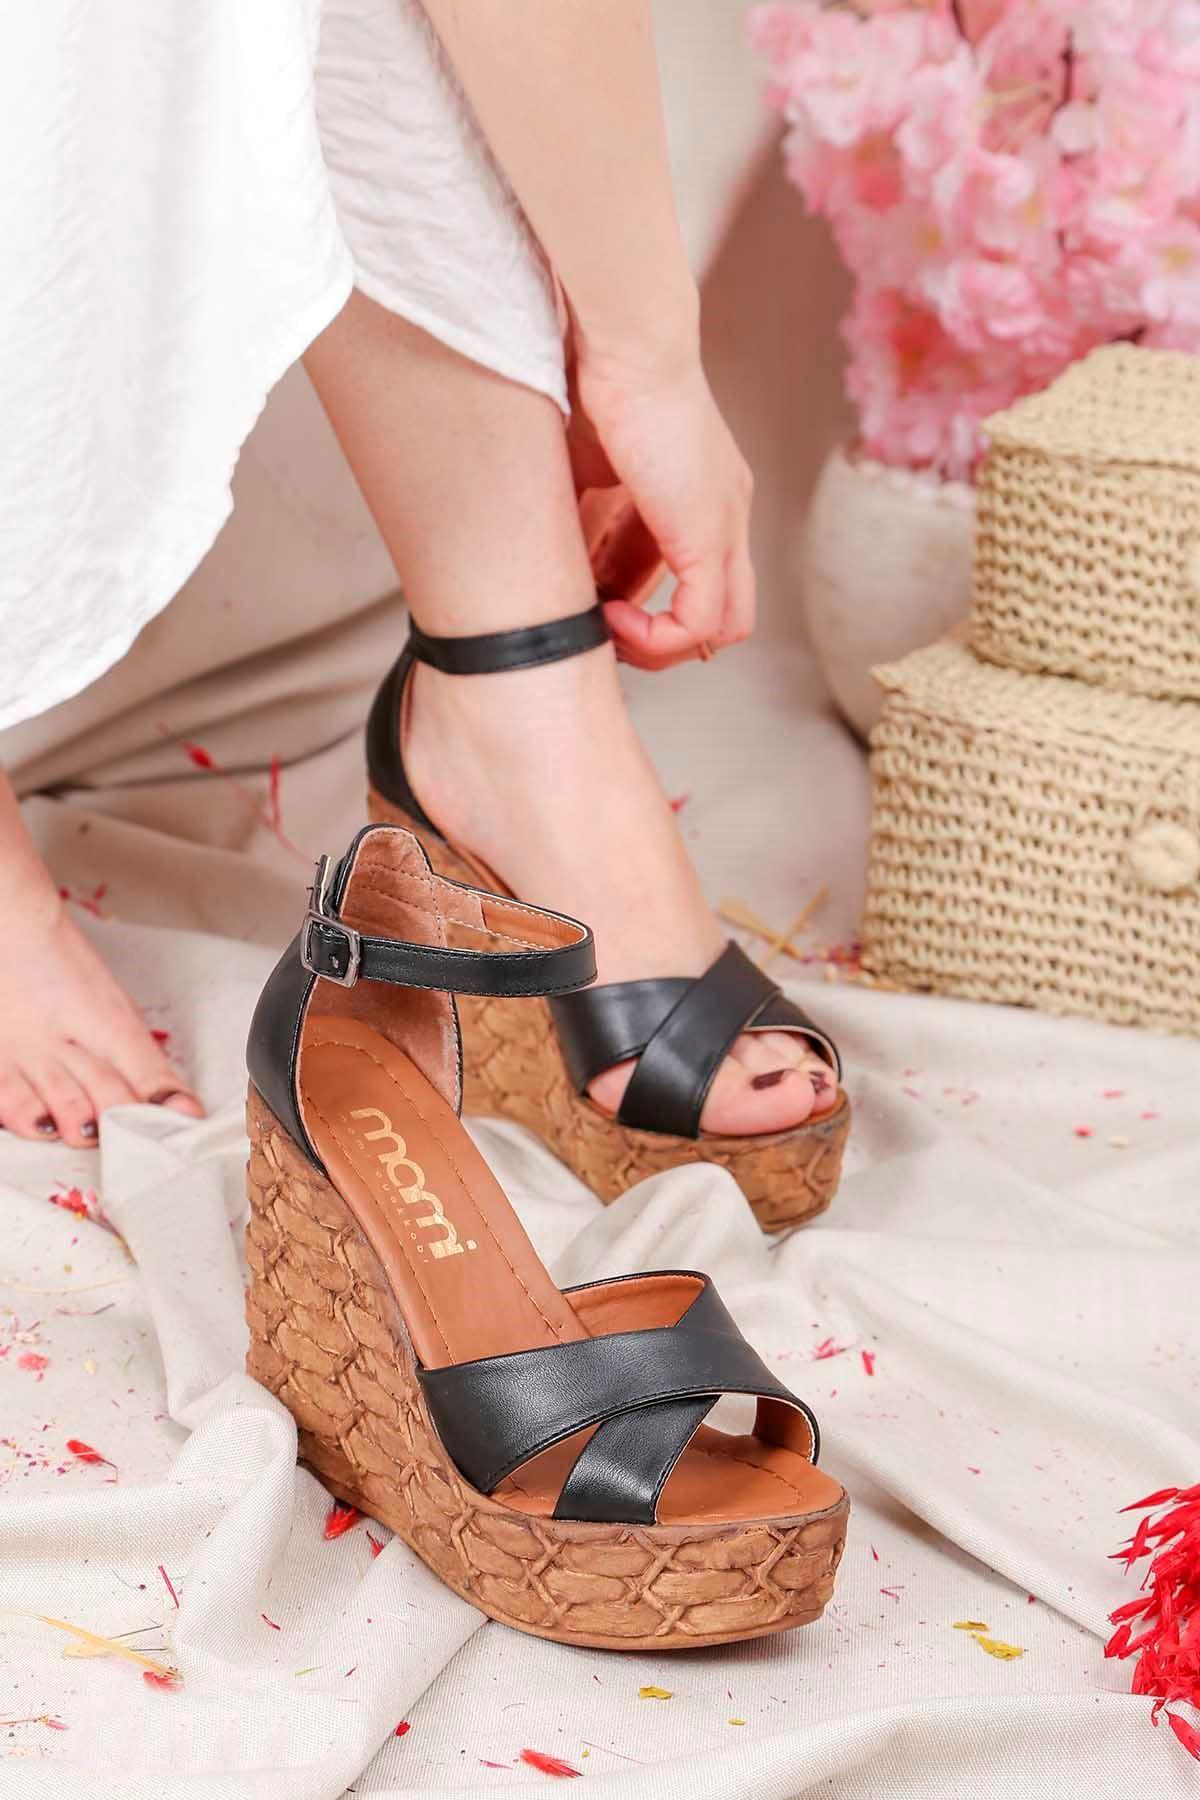 Frm-003 Yüksek Taban Sandalet Siyah Deri